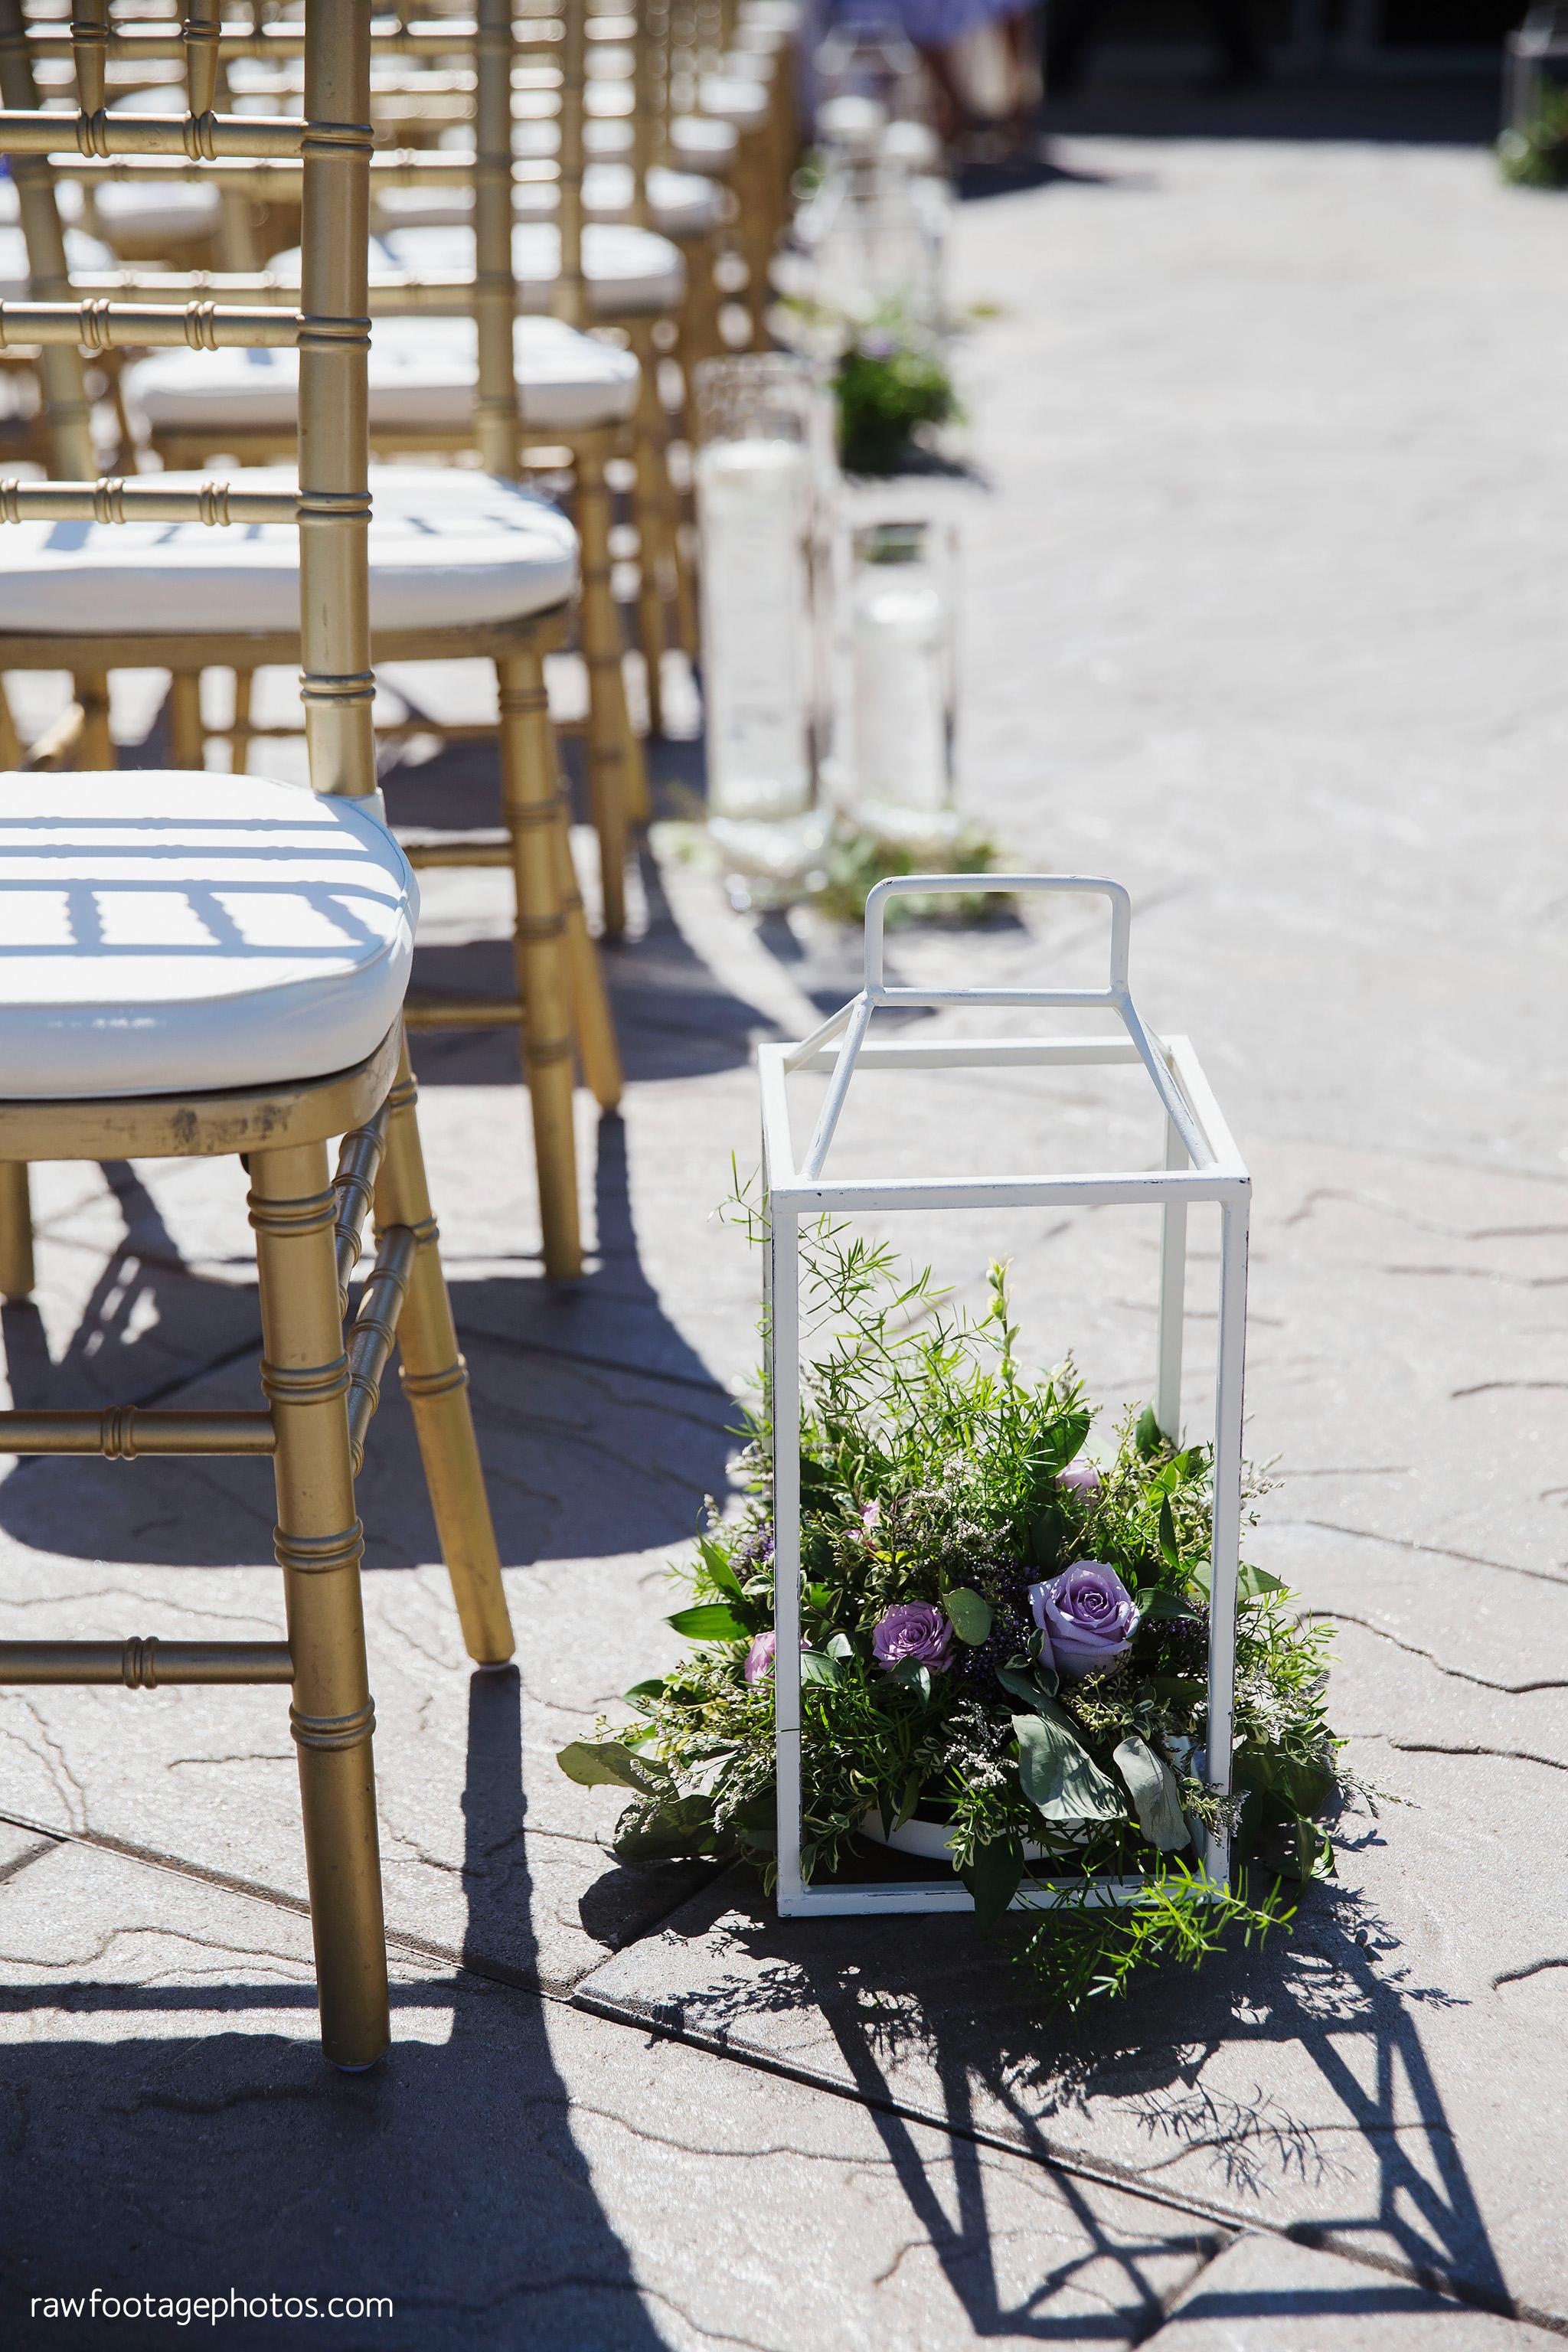 london_ontario_wedding_photographer-grand_bend_wedding_photographer-oakwood_resort_wedding-beach_wedding-sunset_wedding-raw_footage_photography032.jpg